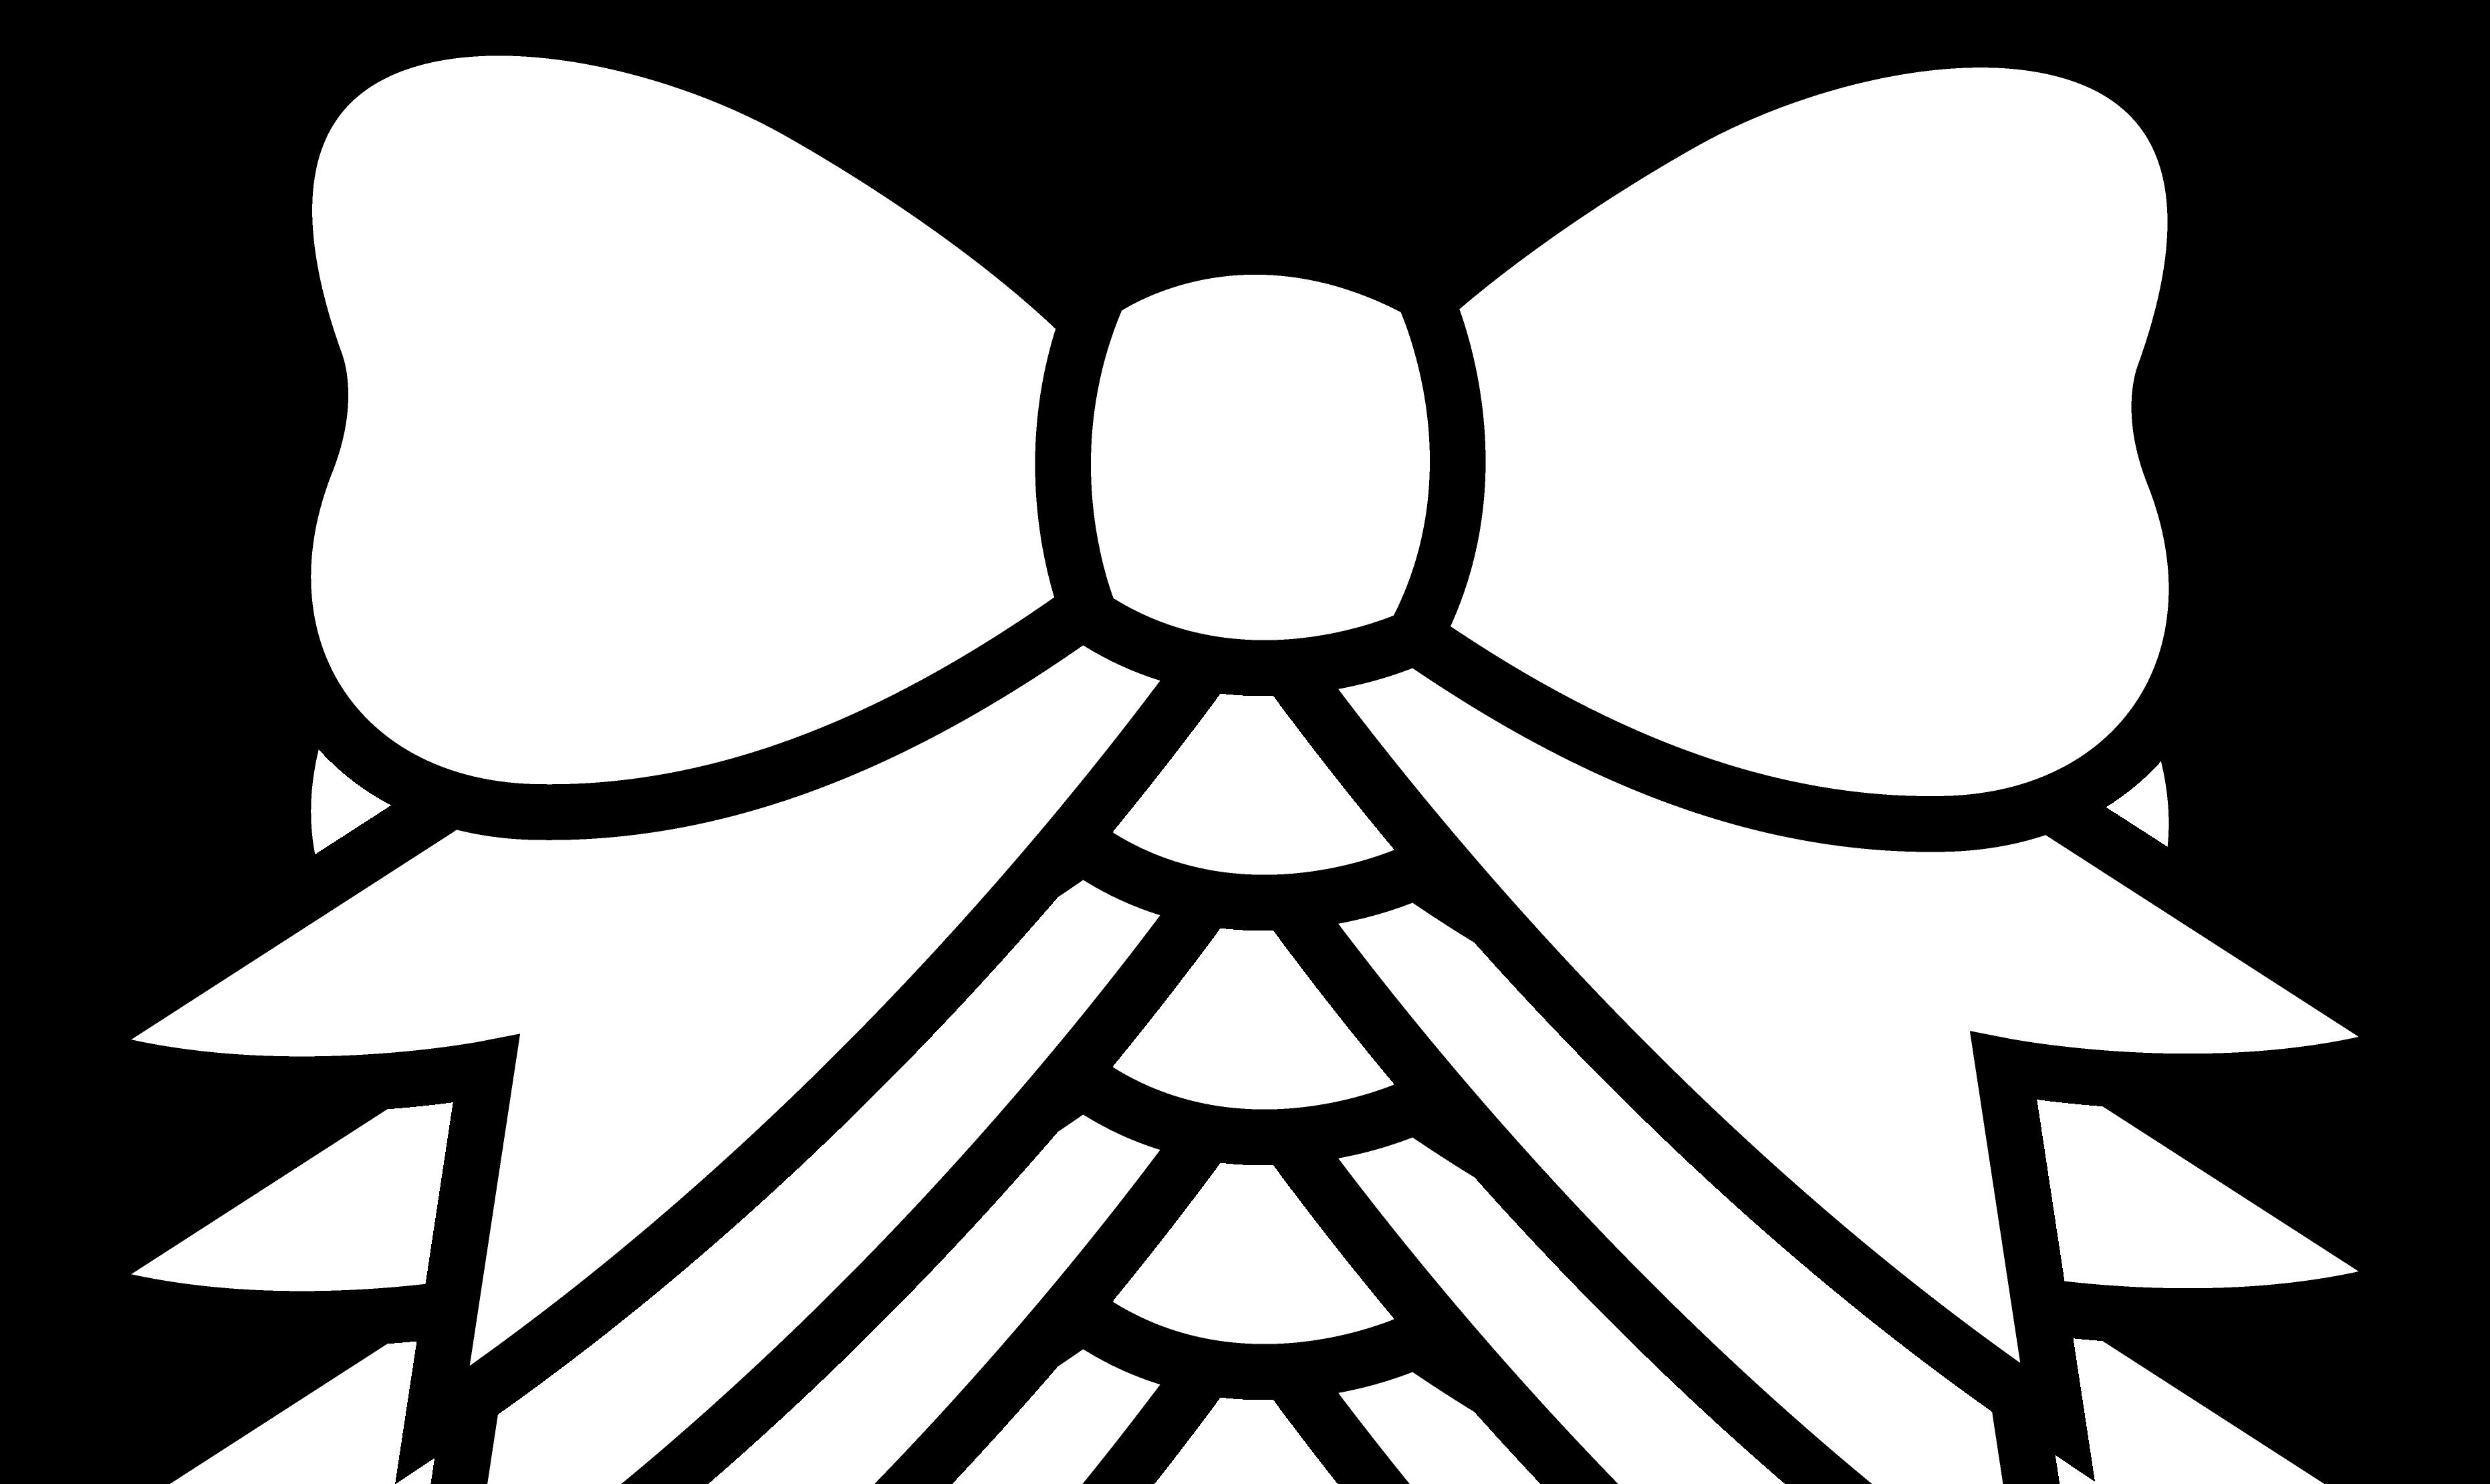 ribbon clipart-ribbon clipart-17